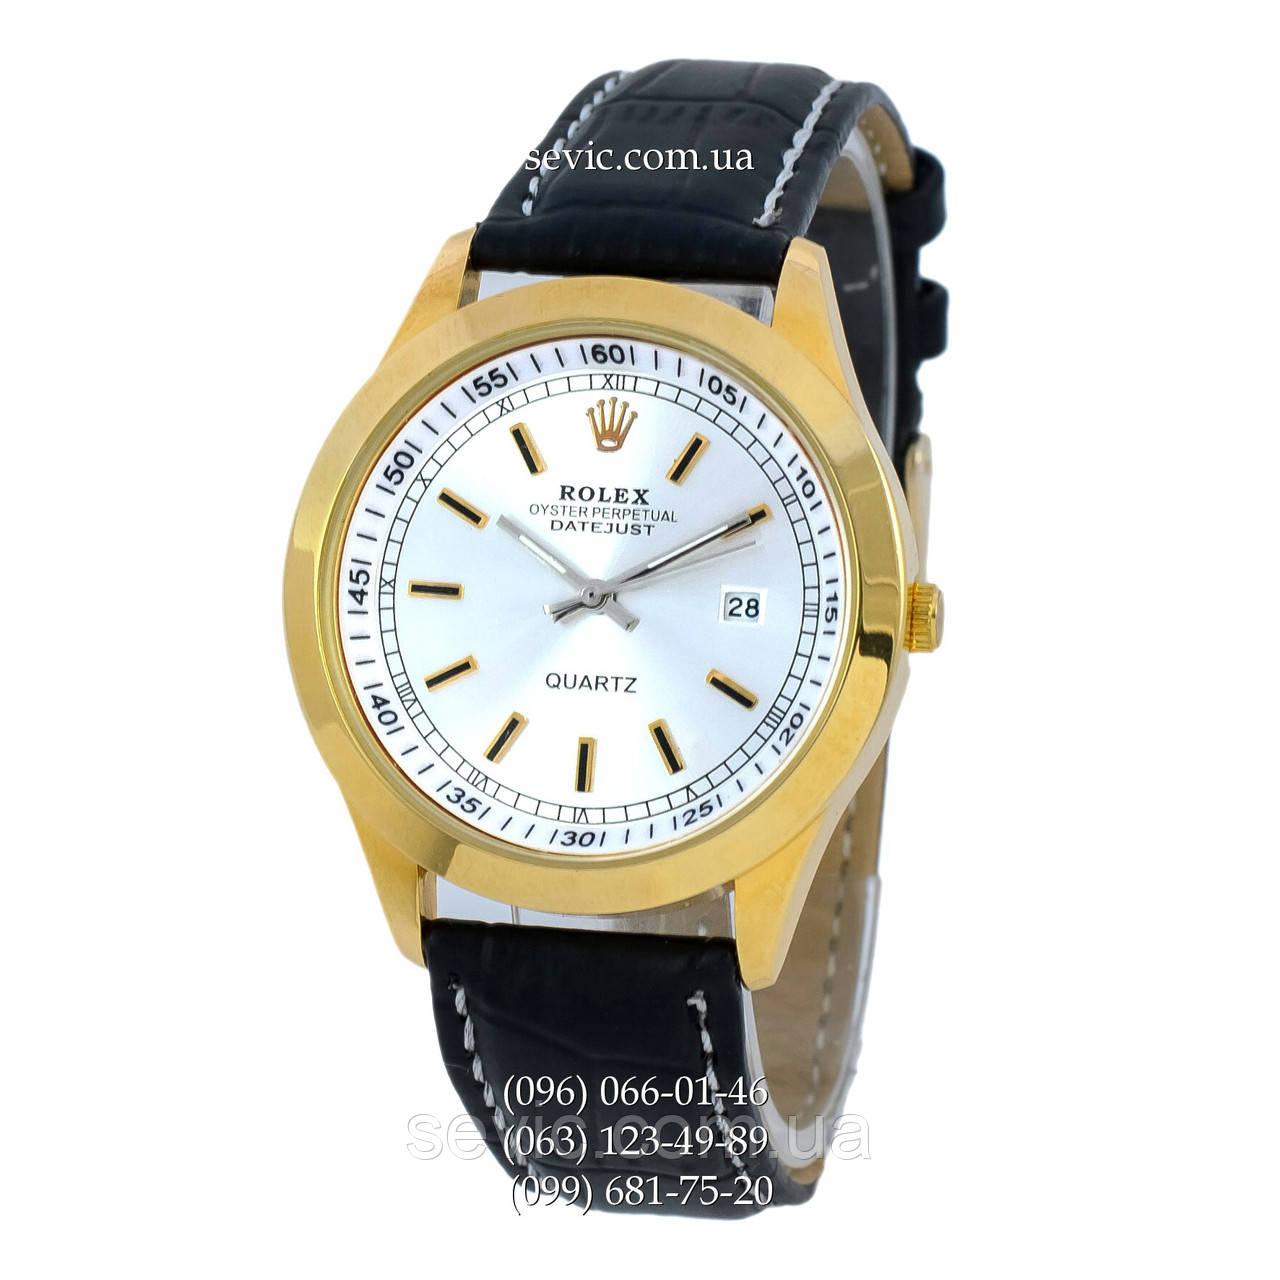 341c60554b2e Наручные часы Rolex Datejust Black-Gold-Silver (реплика) - Интернет магазин